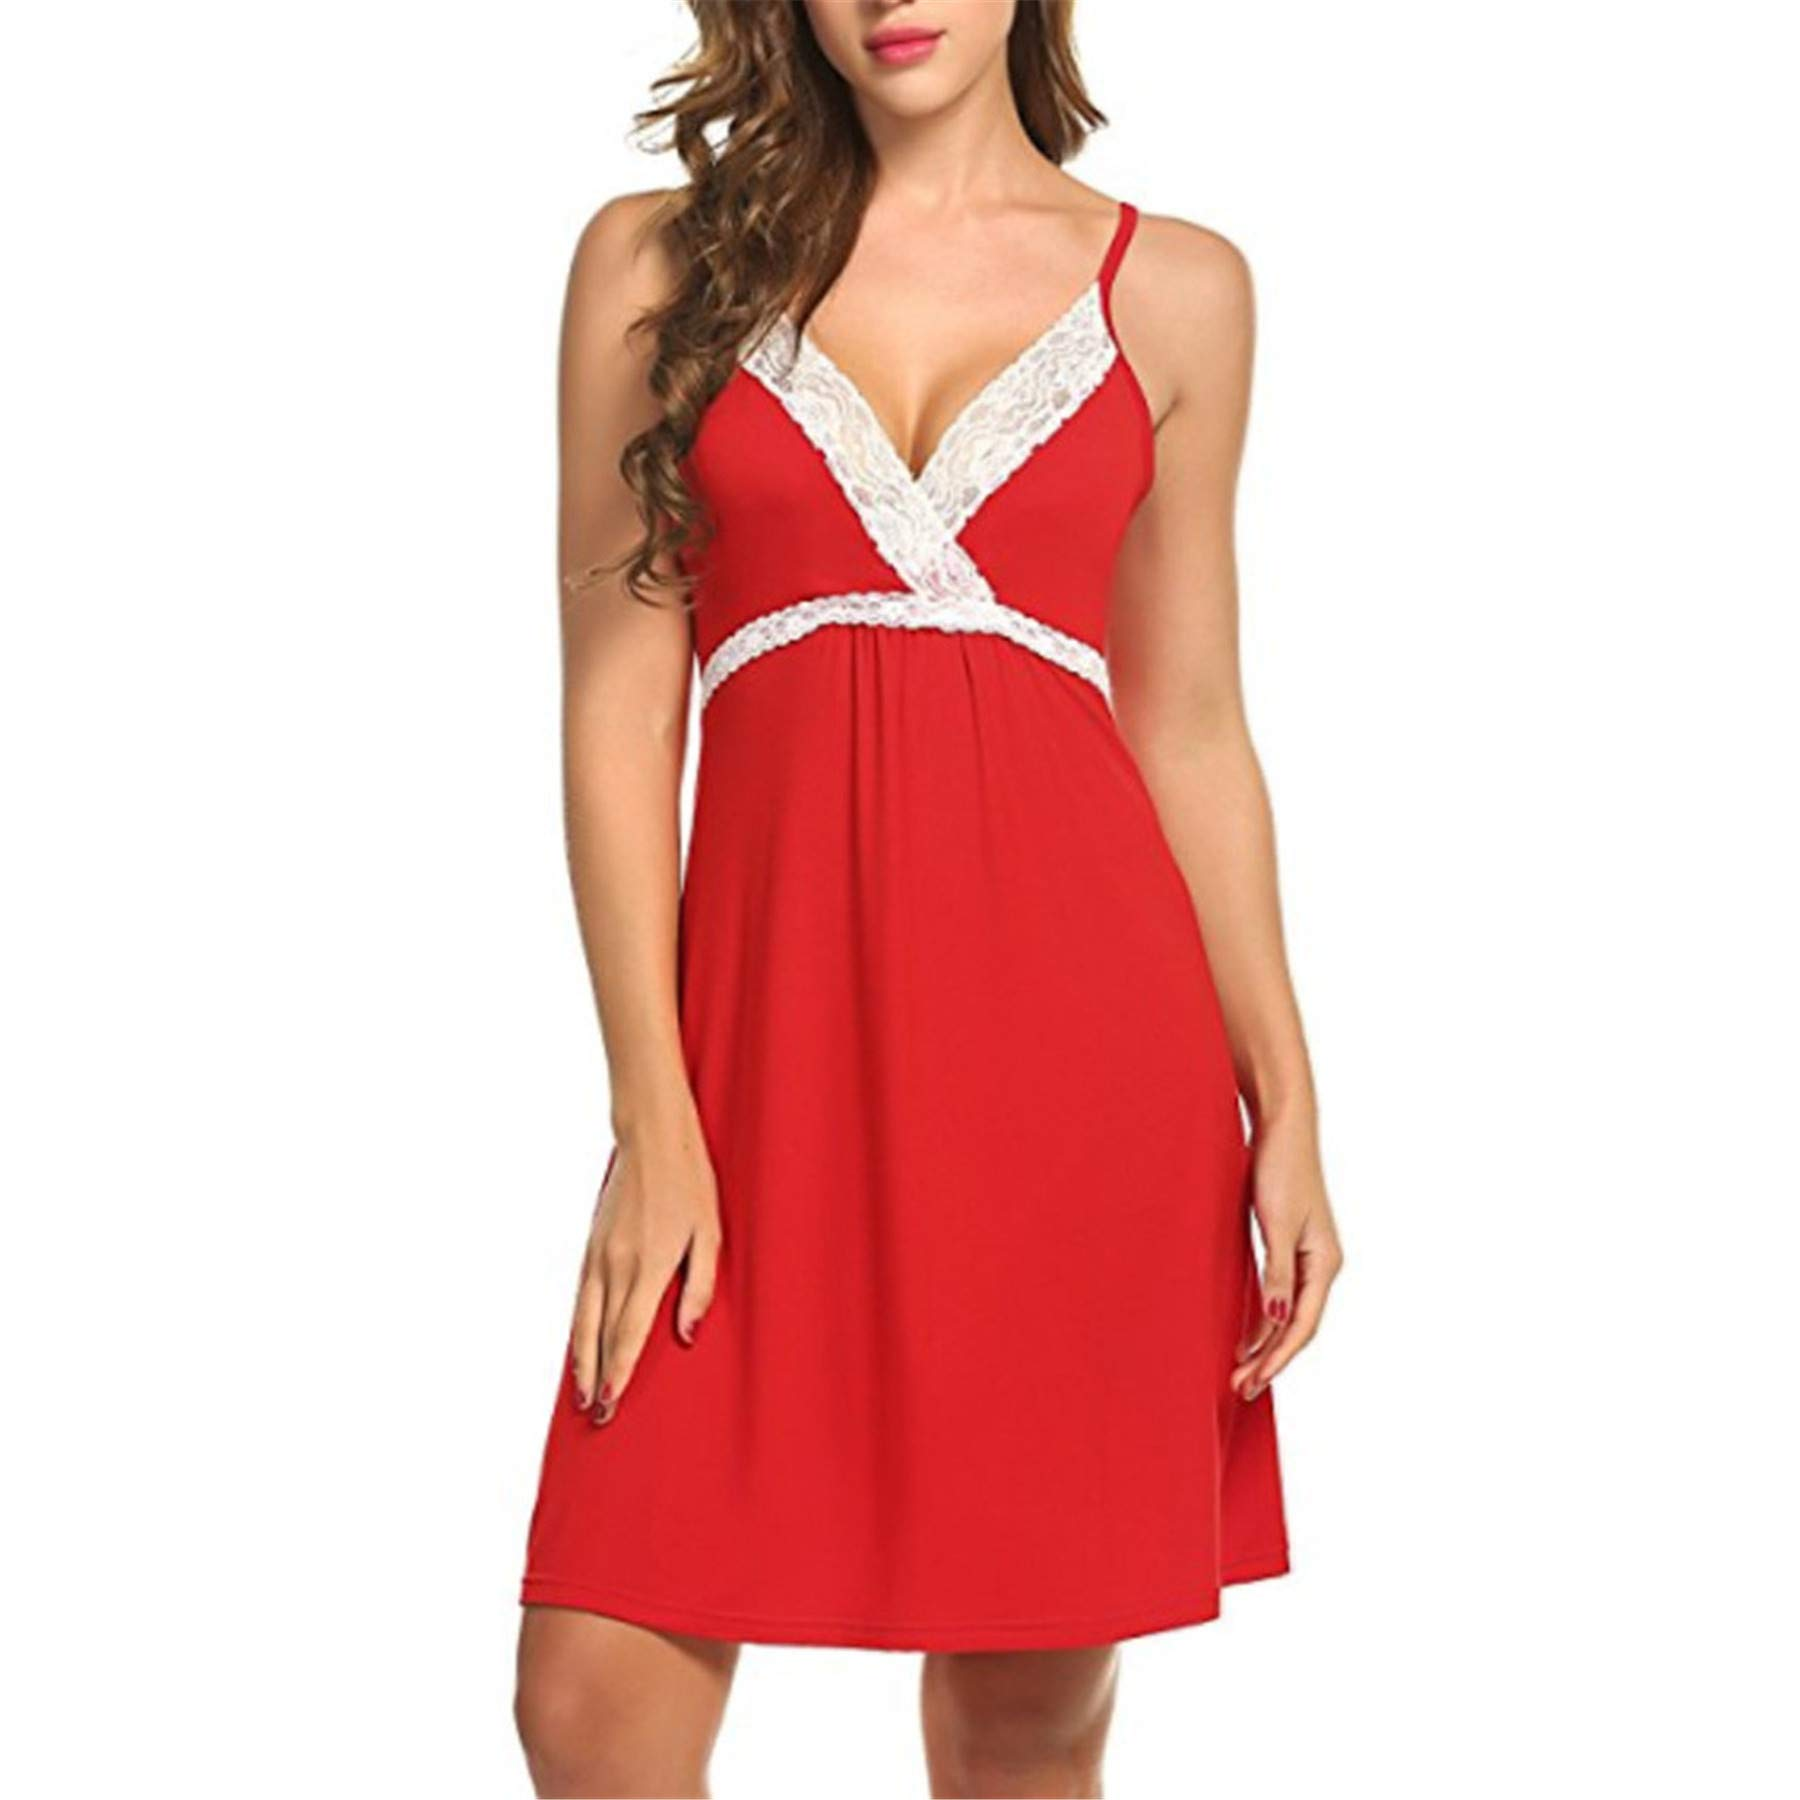 TIFENNY Fashion Sexy Pajamas Lace Sleepwear Lingerie Temptation Underwear Jumpsuit Dress Vest